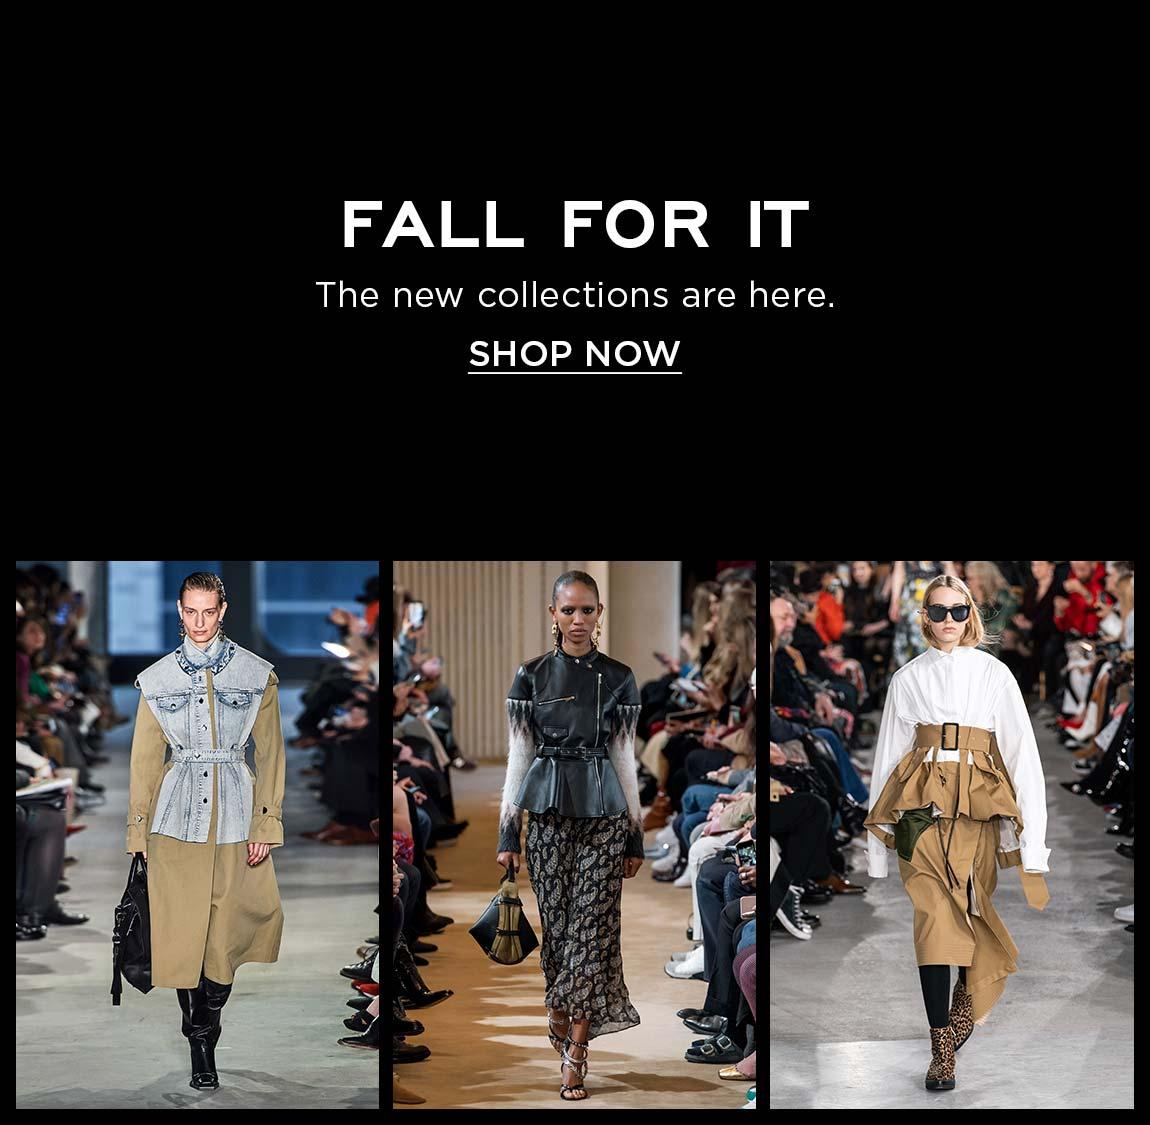 b860dee2f71 Prada, Jimmy Choo, Gucci, Lanvin, Dolce & Gabbana | Bergdorf Goodman